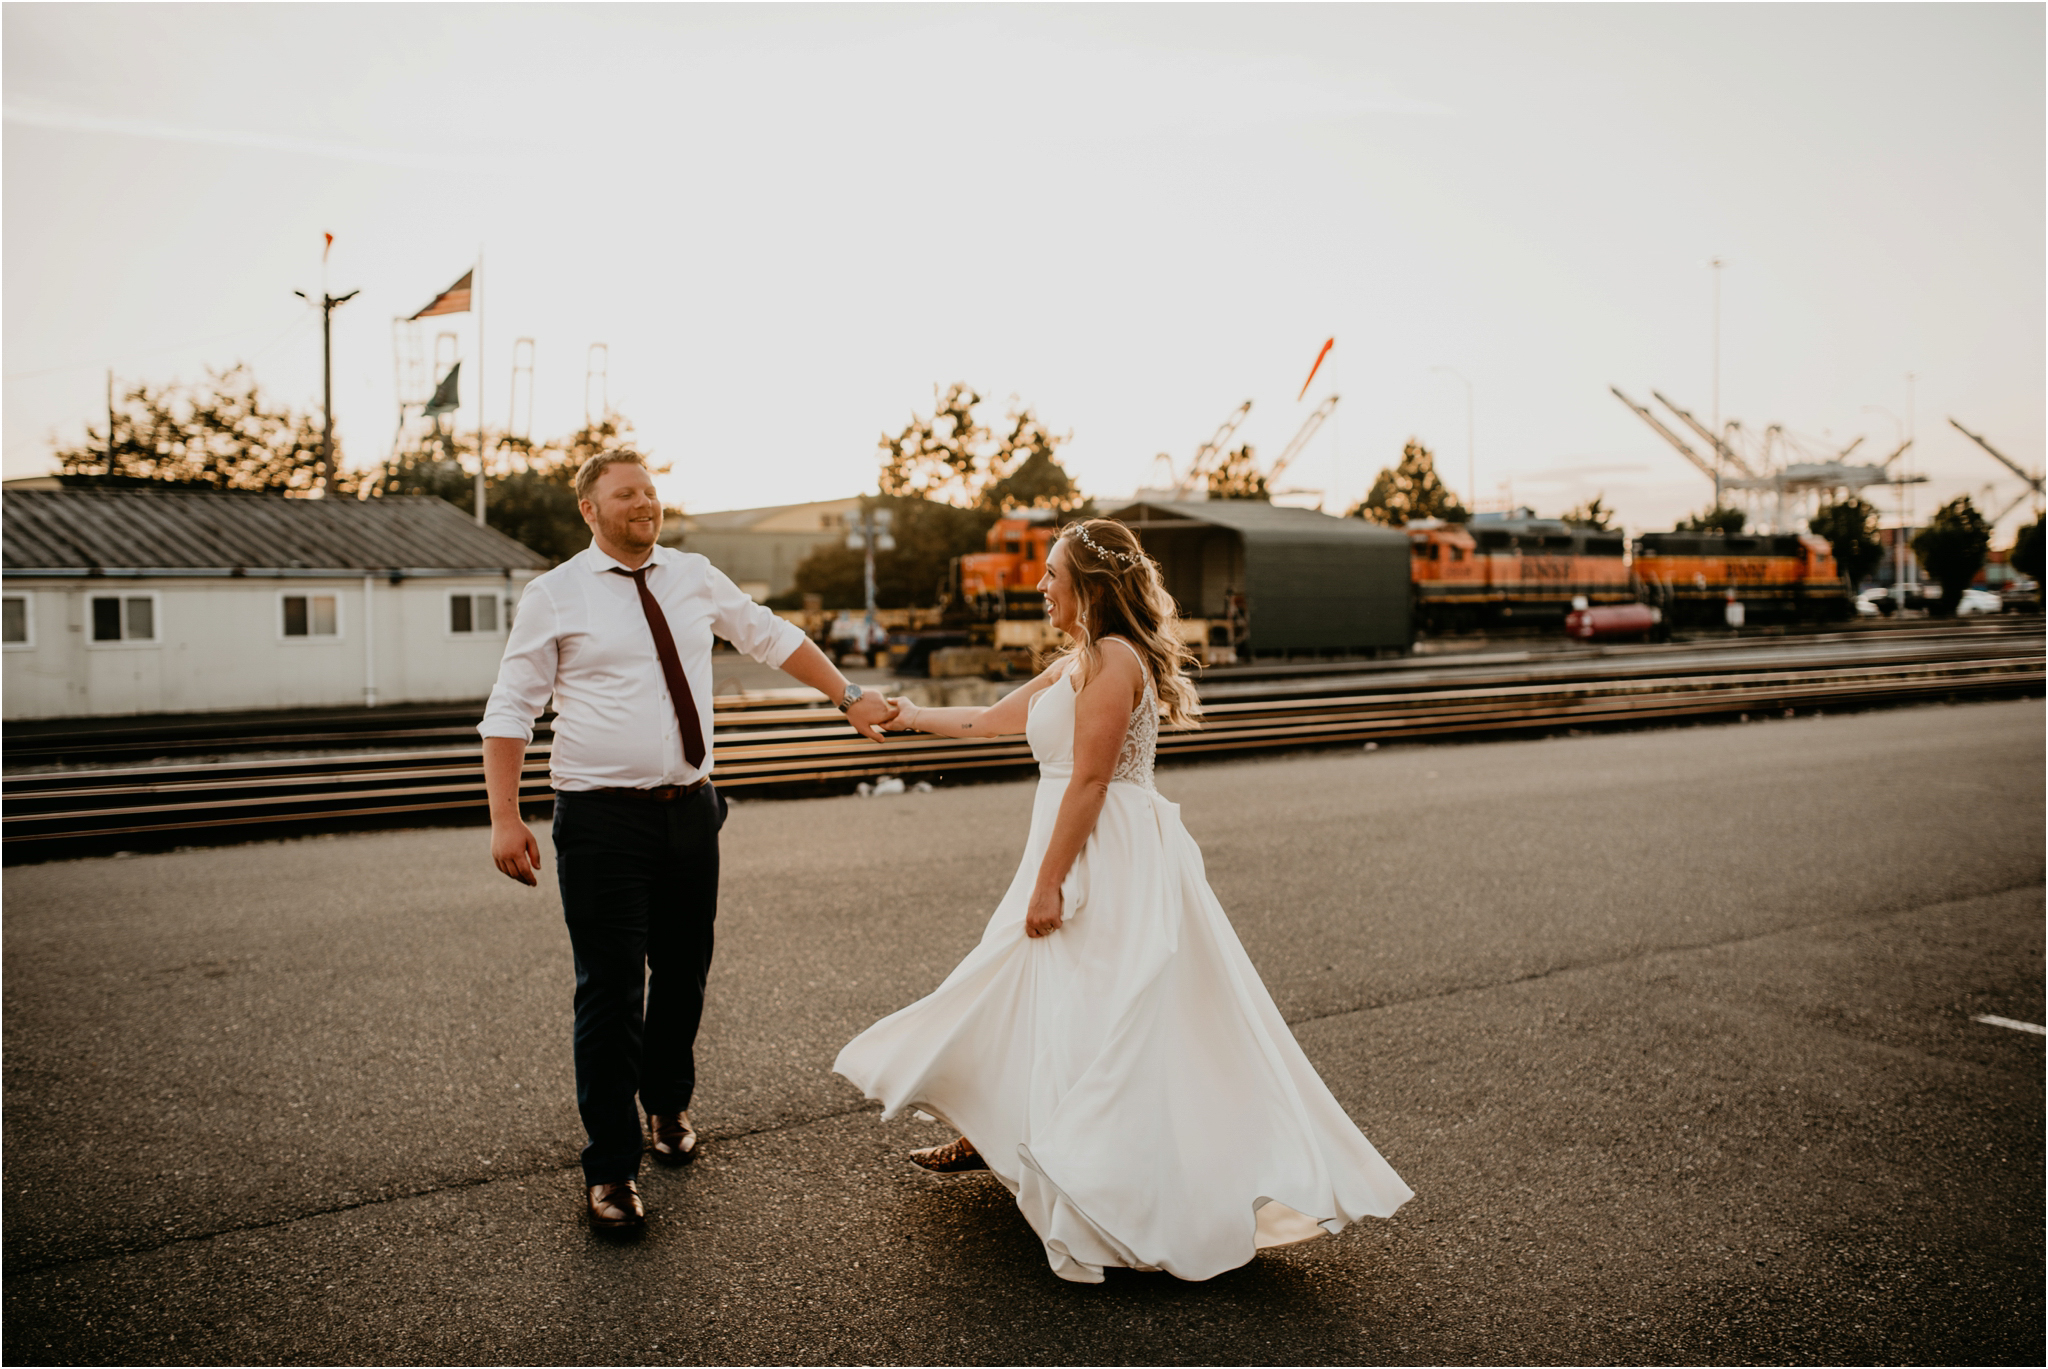 laura-and-matt-metropolist-urban-seattle-wedding-photographer-137.jpg